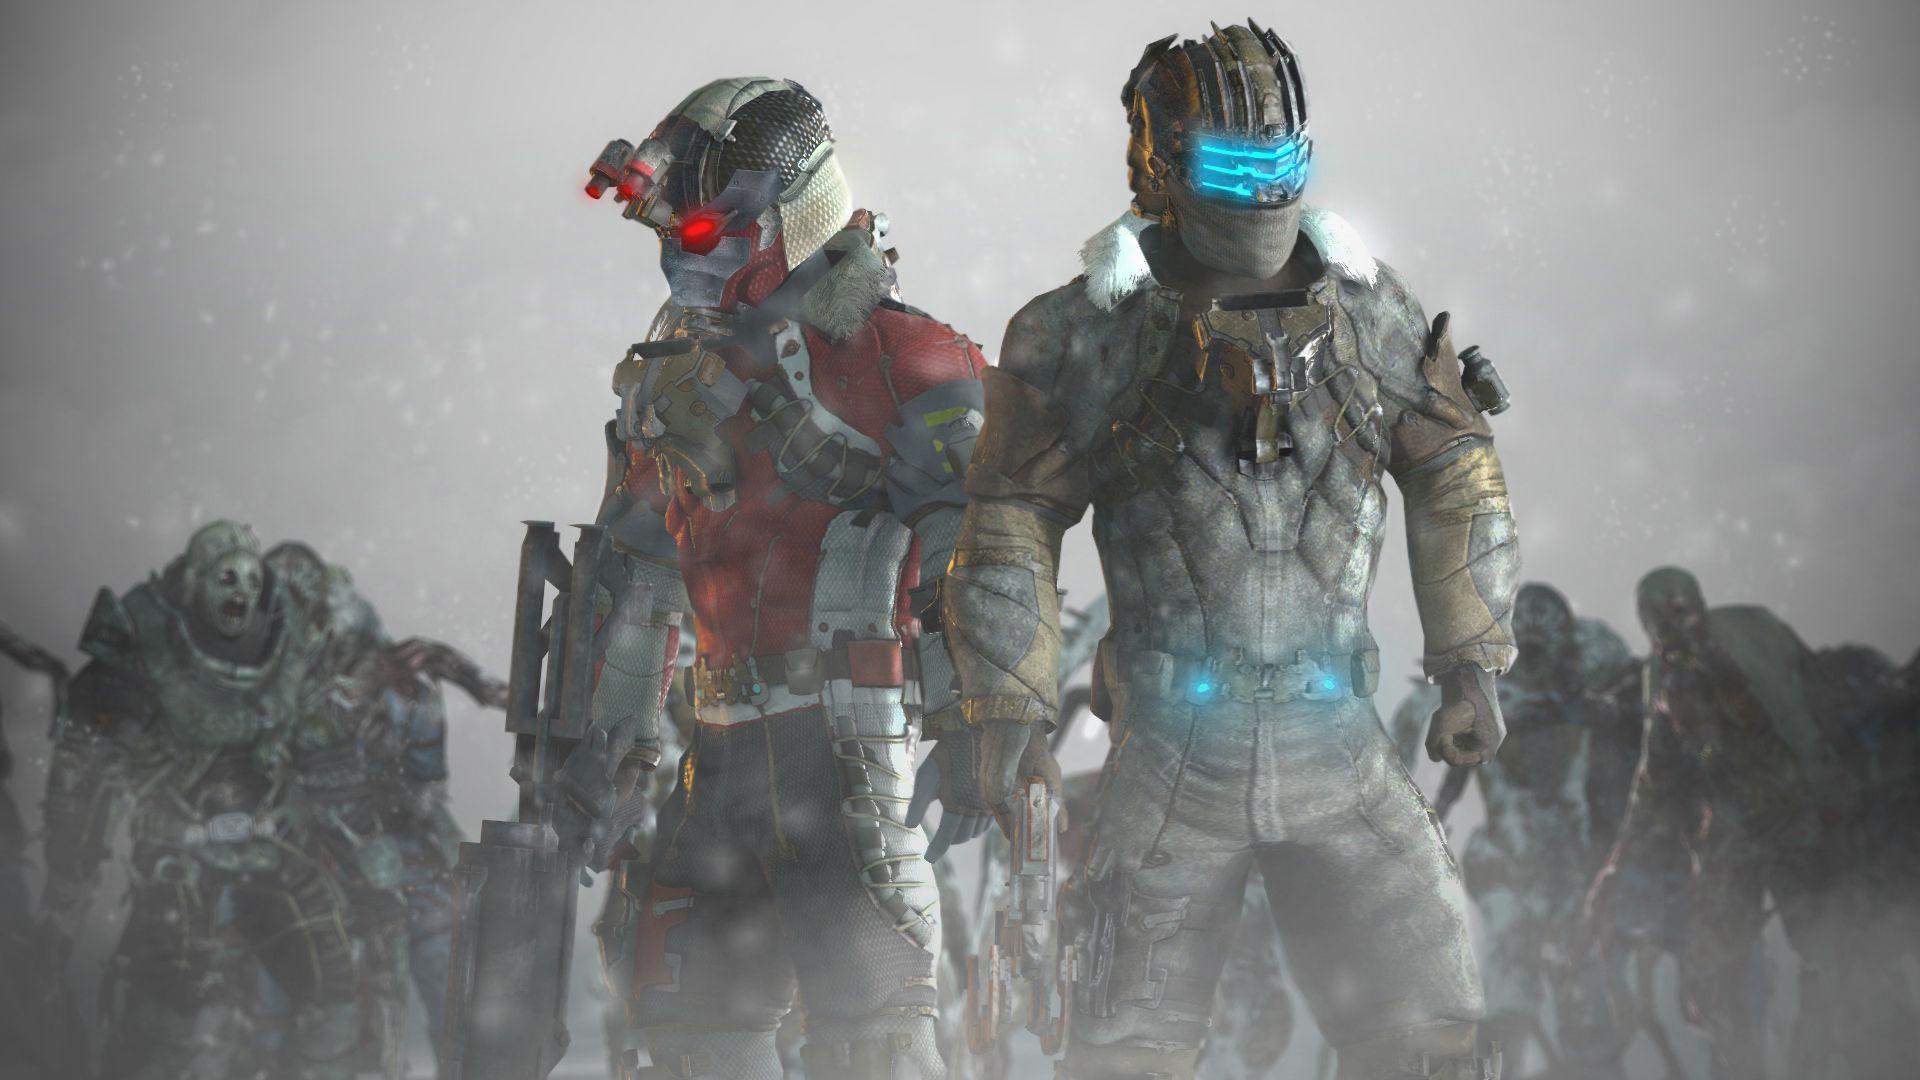 Dead Space 3 (Garry's Mod) by SideZeo deviantart com on